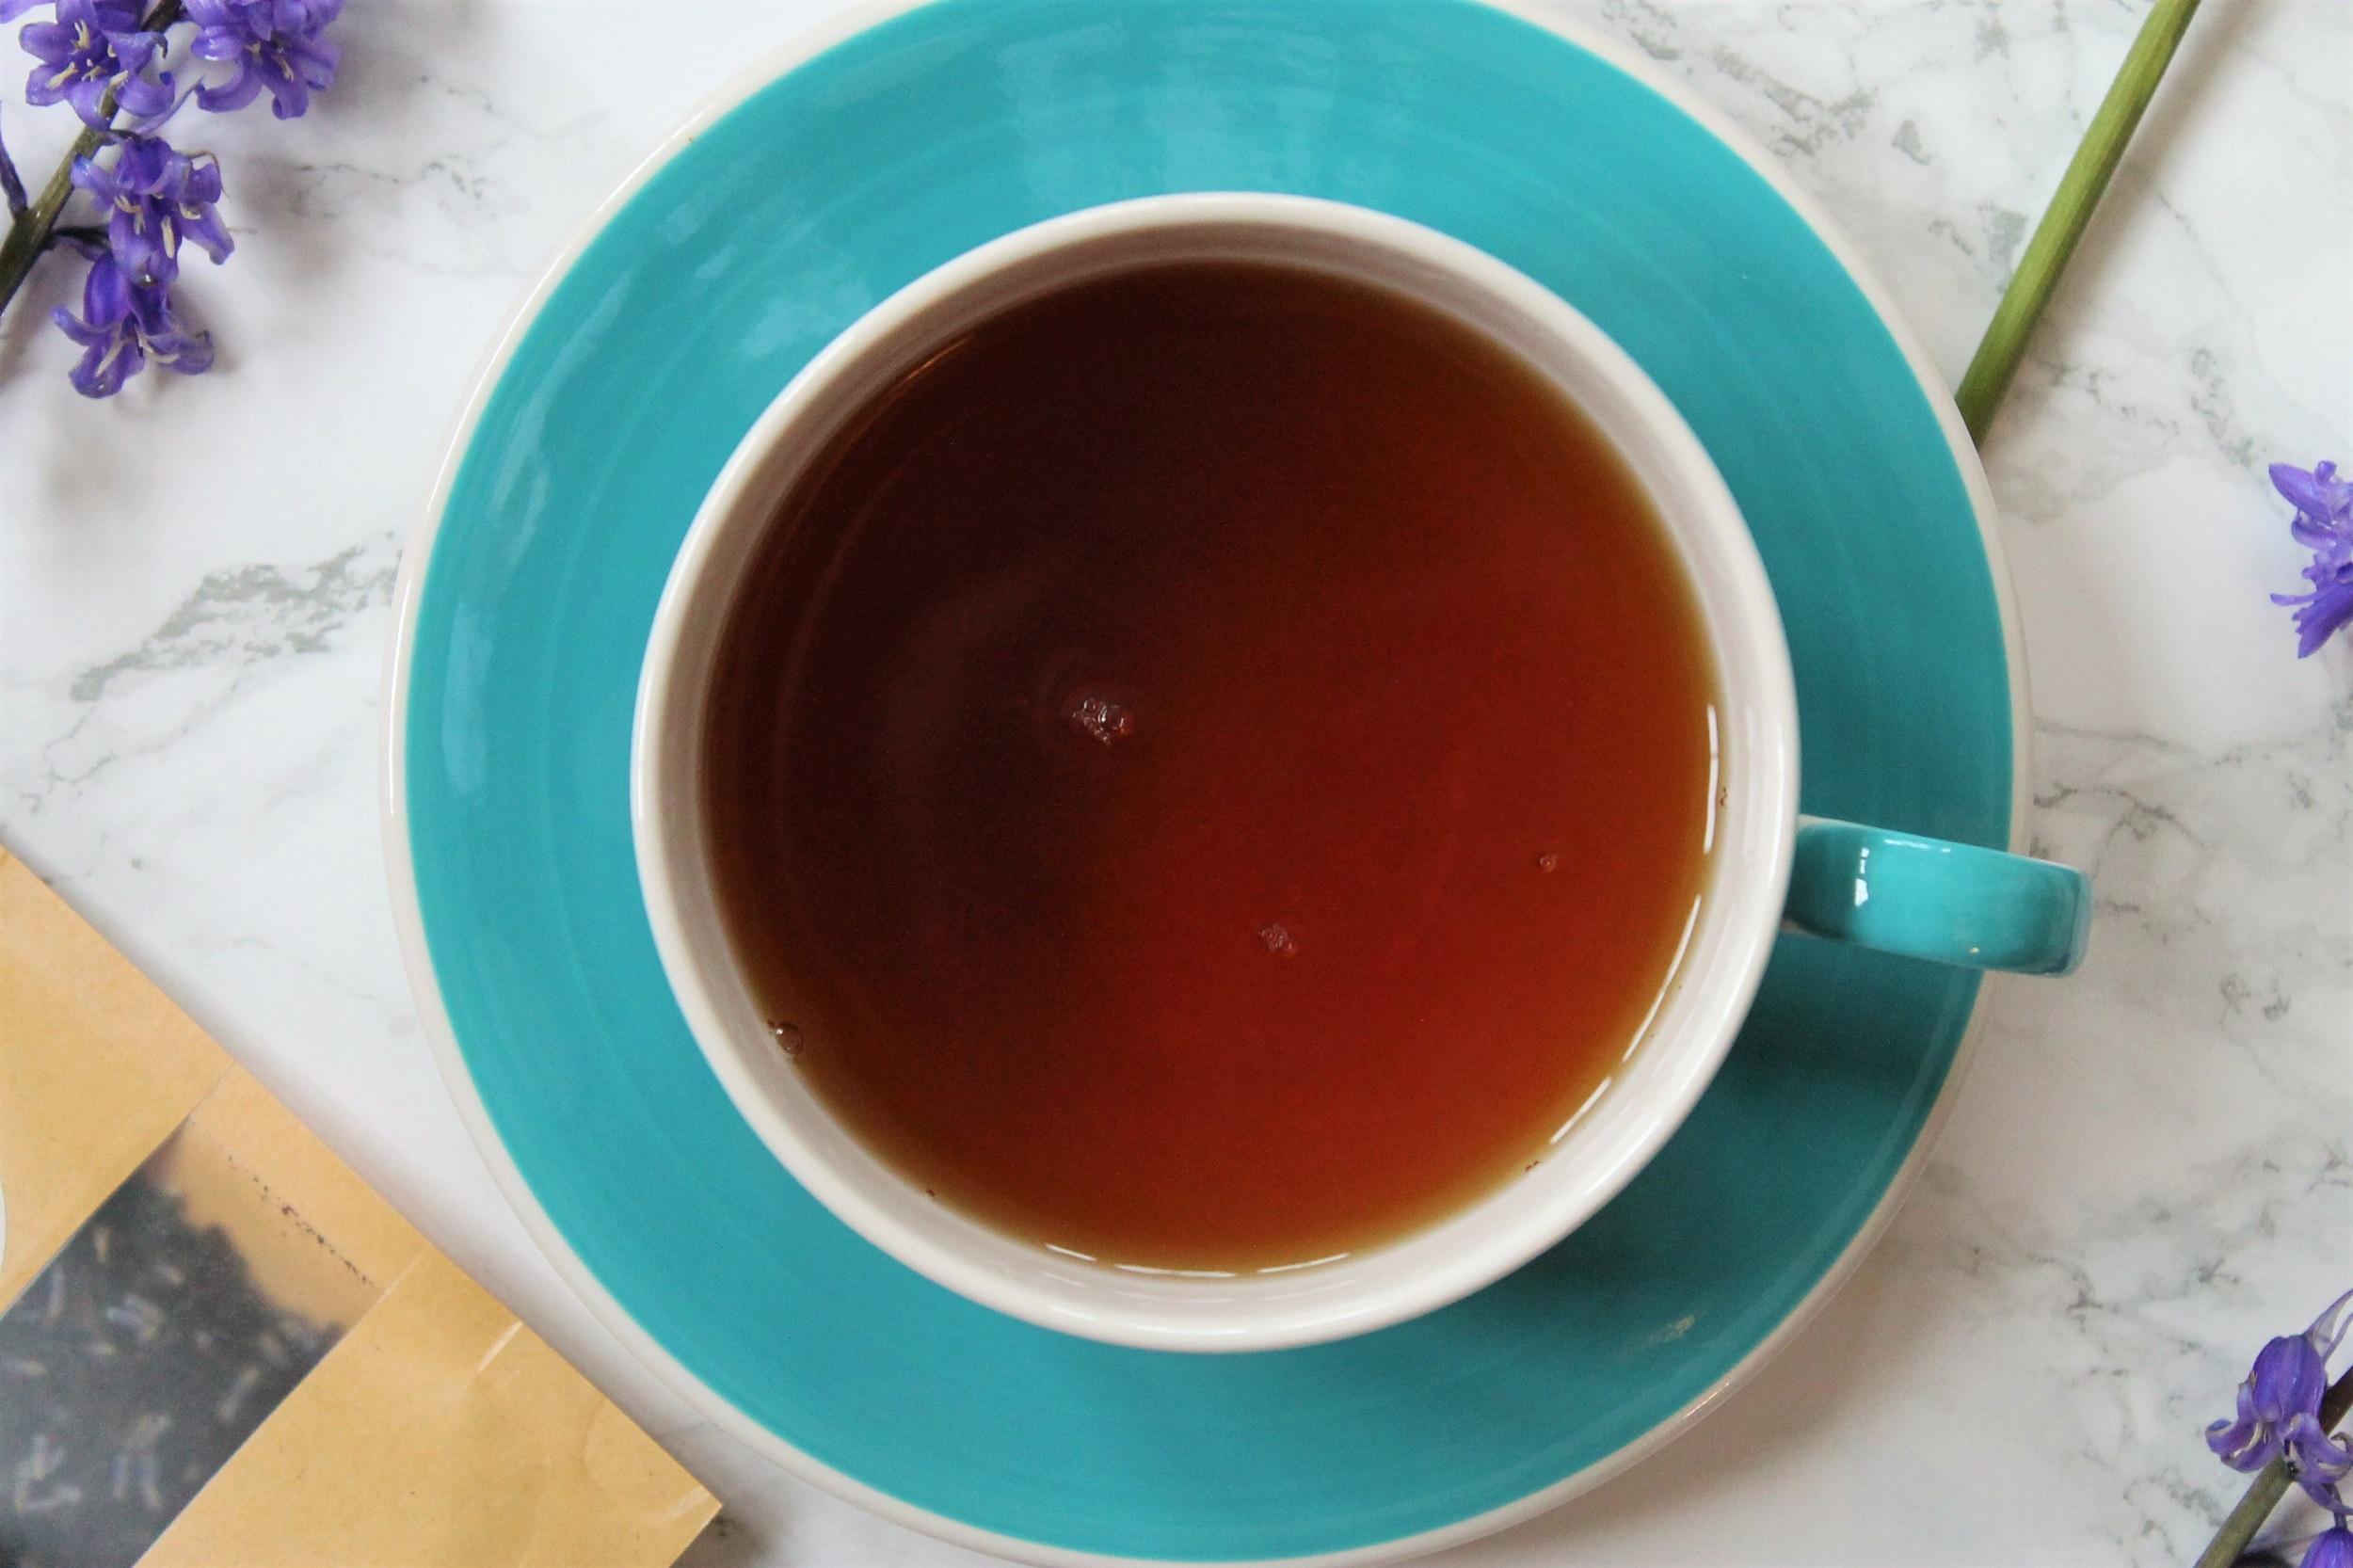 wake-up wildcats oregon tea musketeers